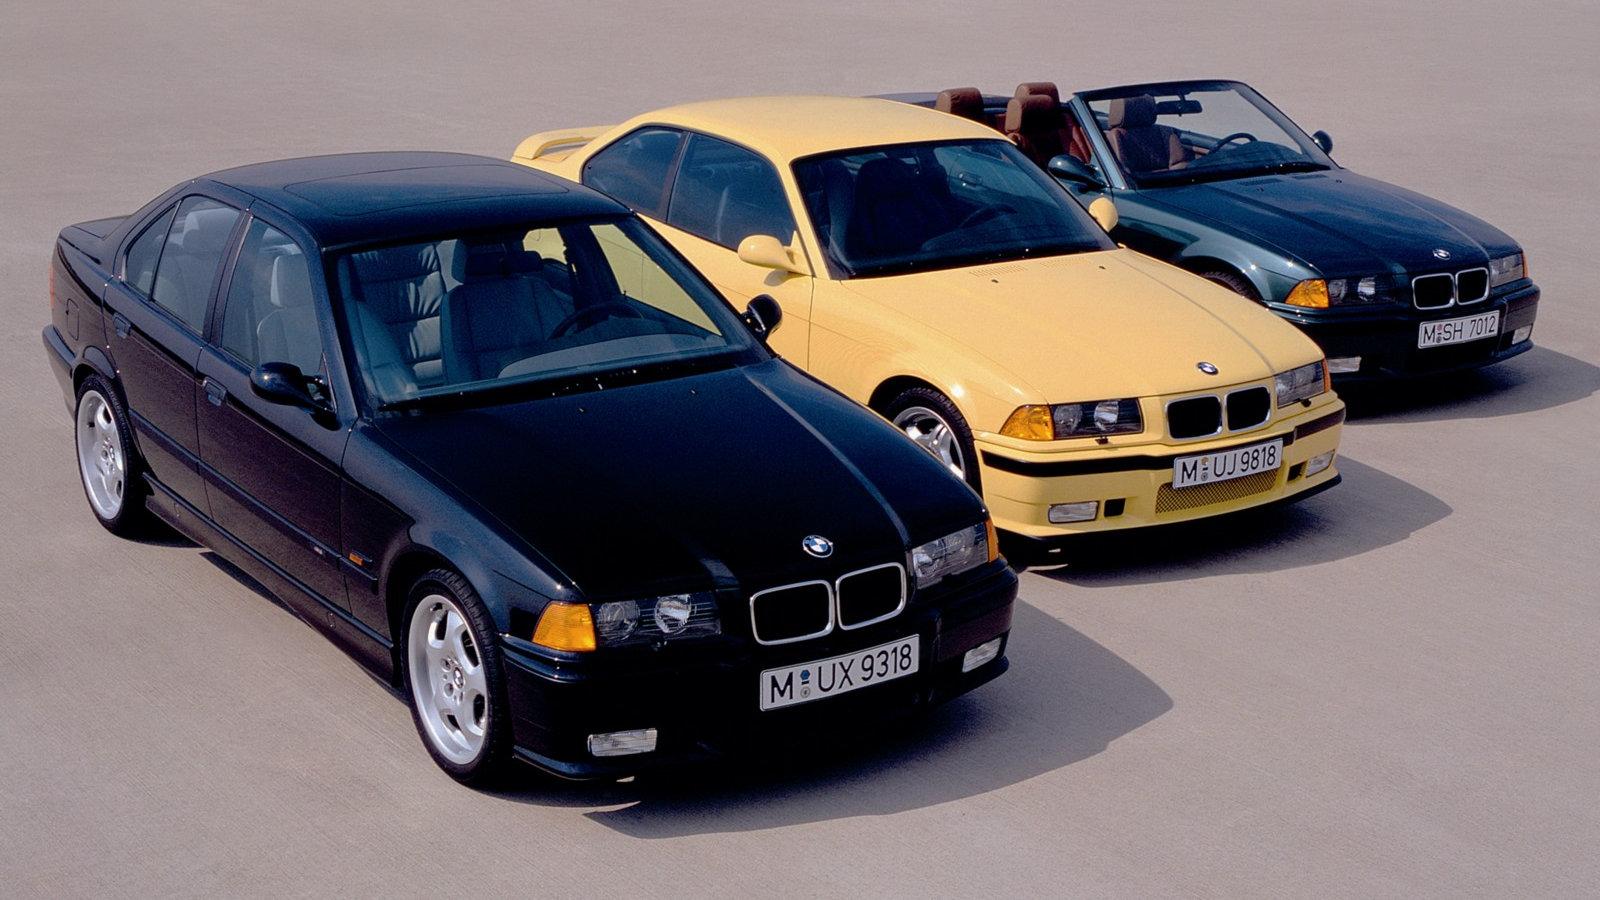 Coche del día: BMW M3 (E36)